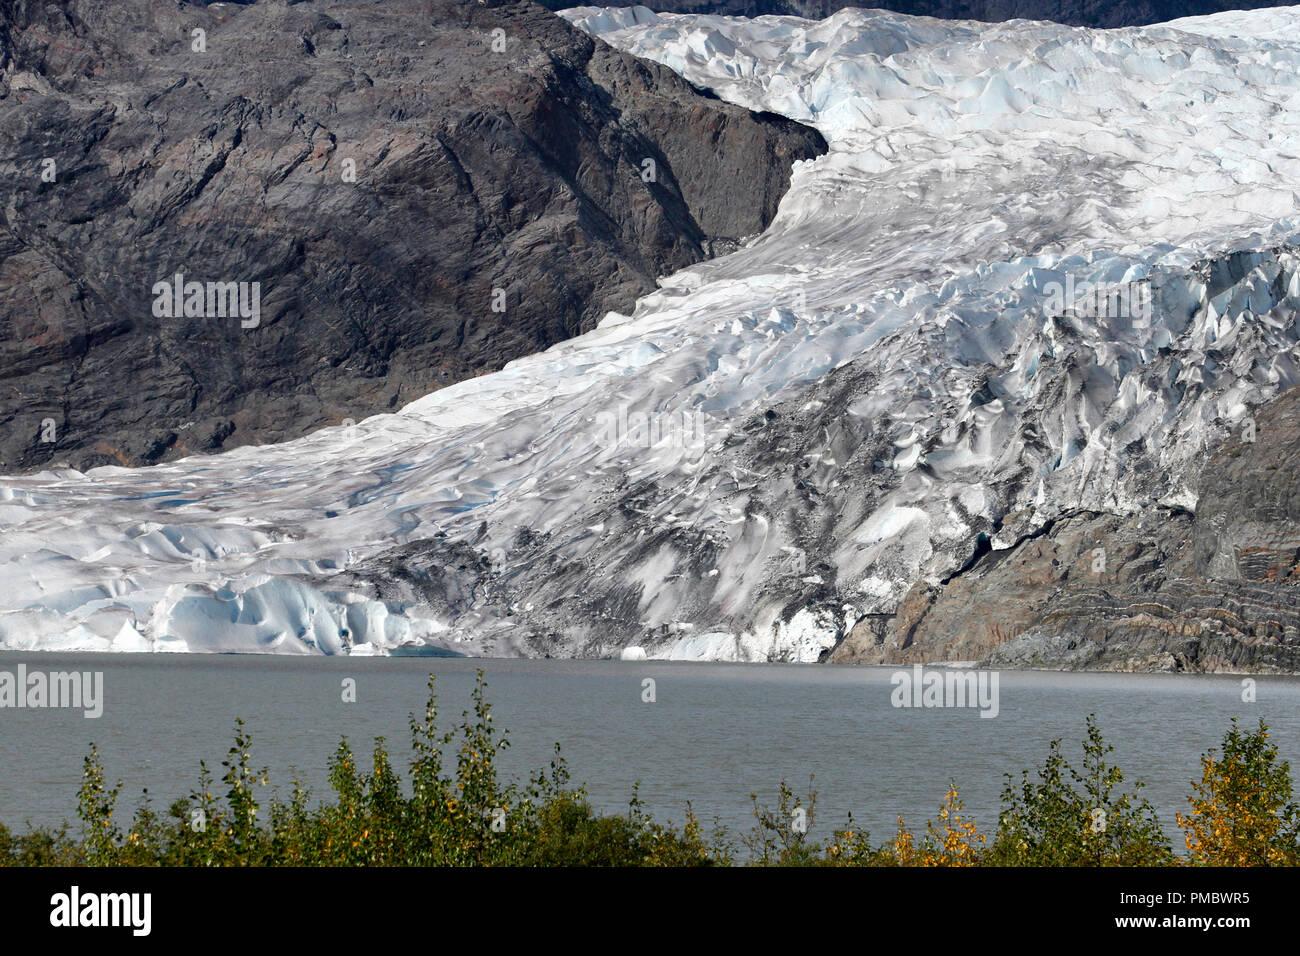 Mendenhall Glacier in Juneau, Alaska - Stock Image